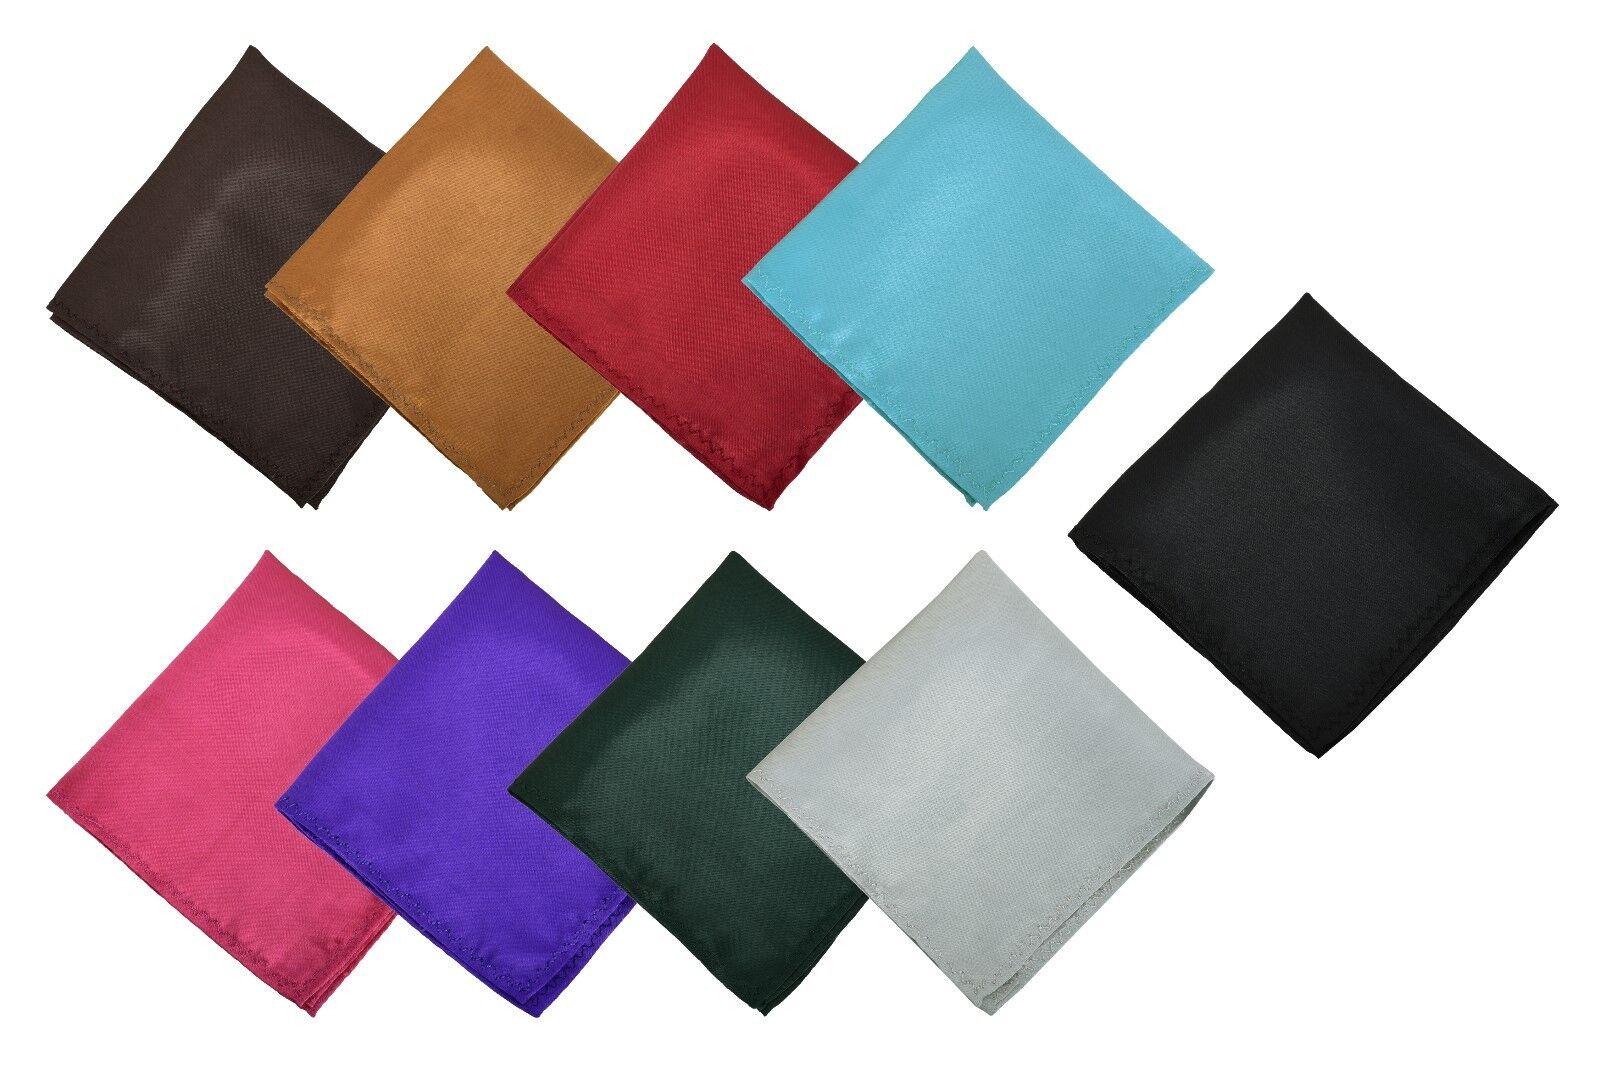 New Satin Solid Plain Wedding Mens Pocket Square Office Suit Handkerchief Hanky